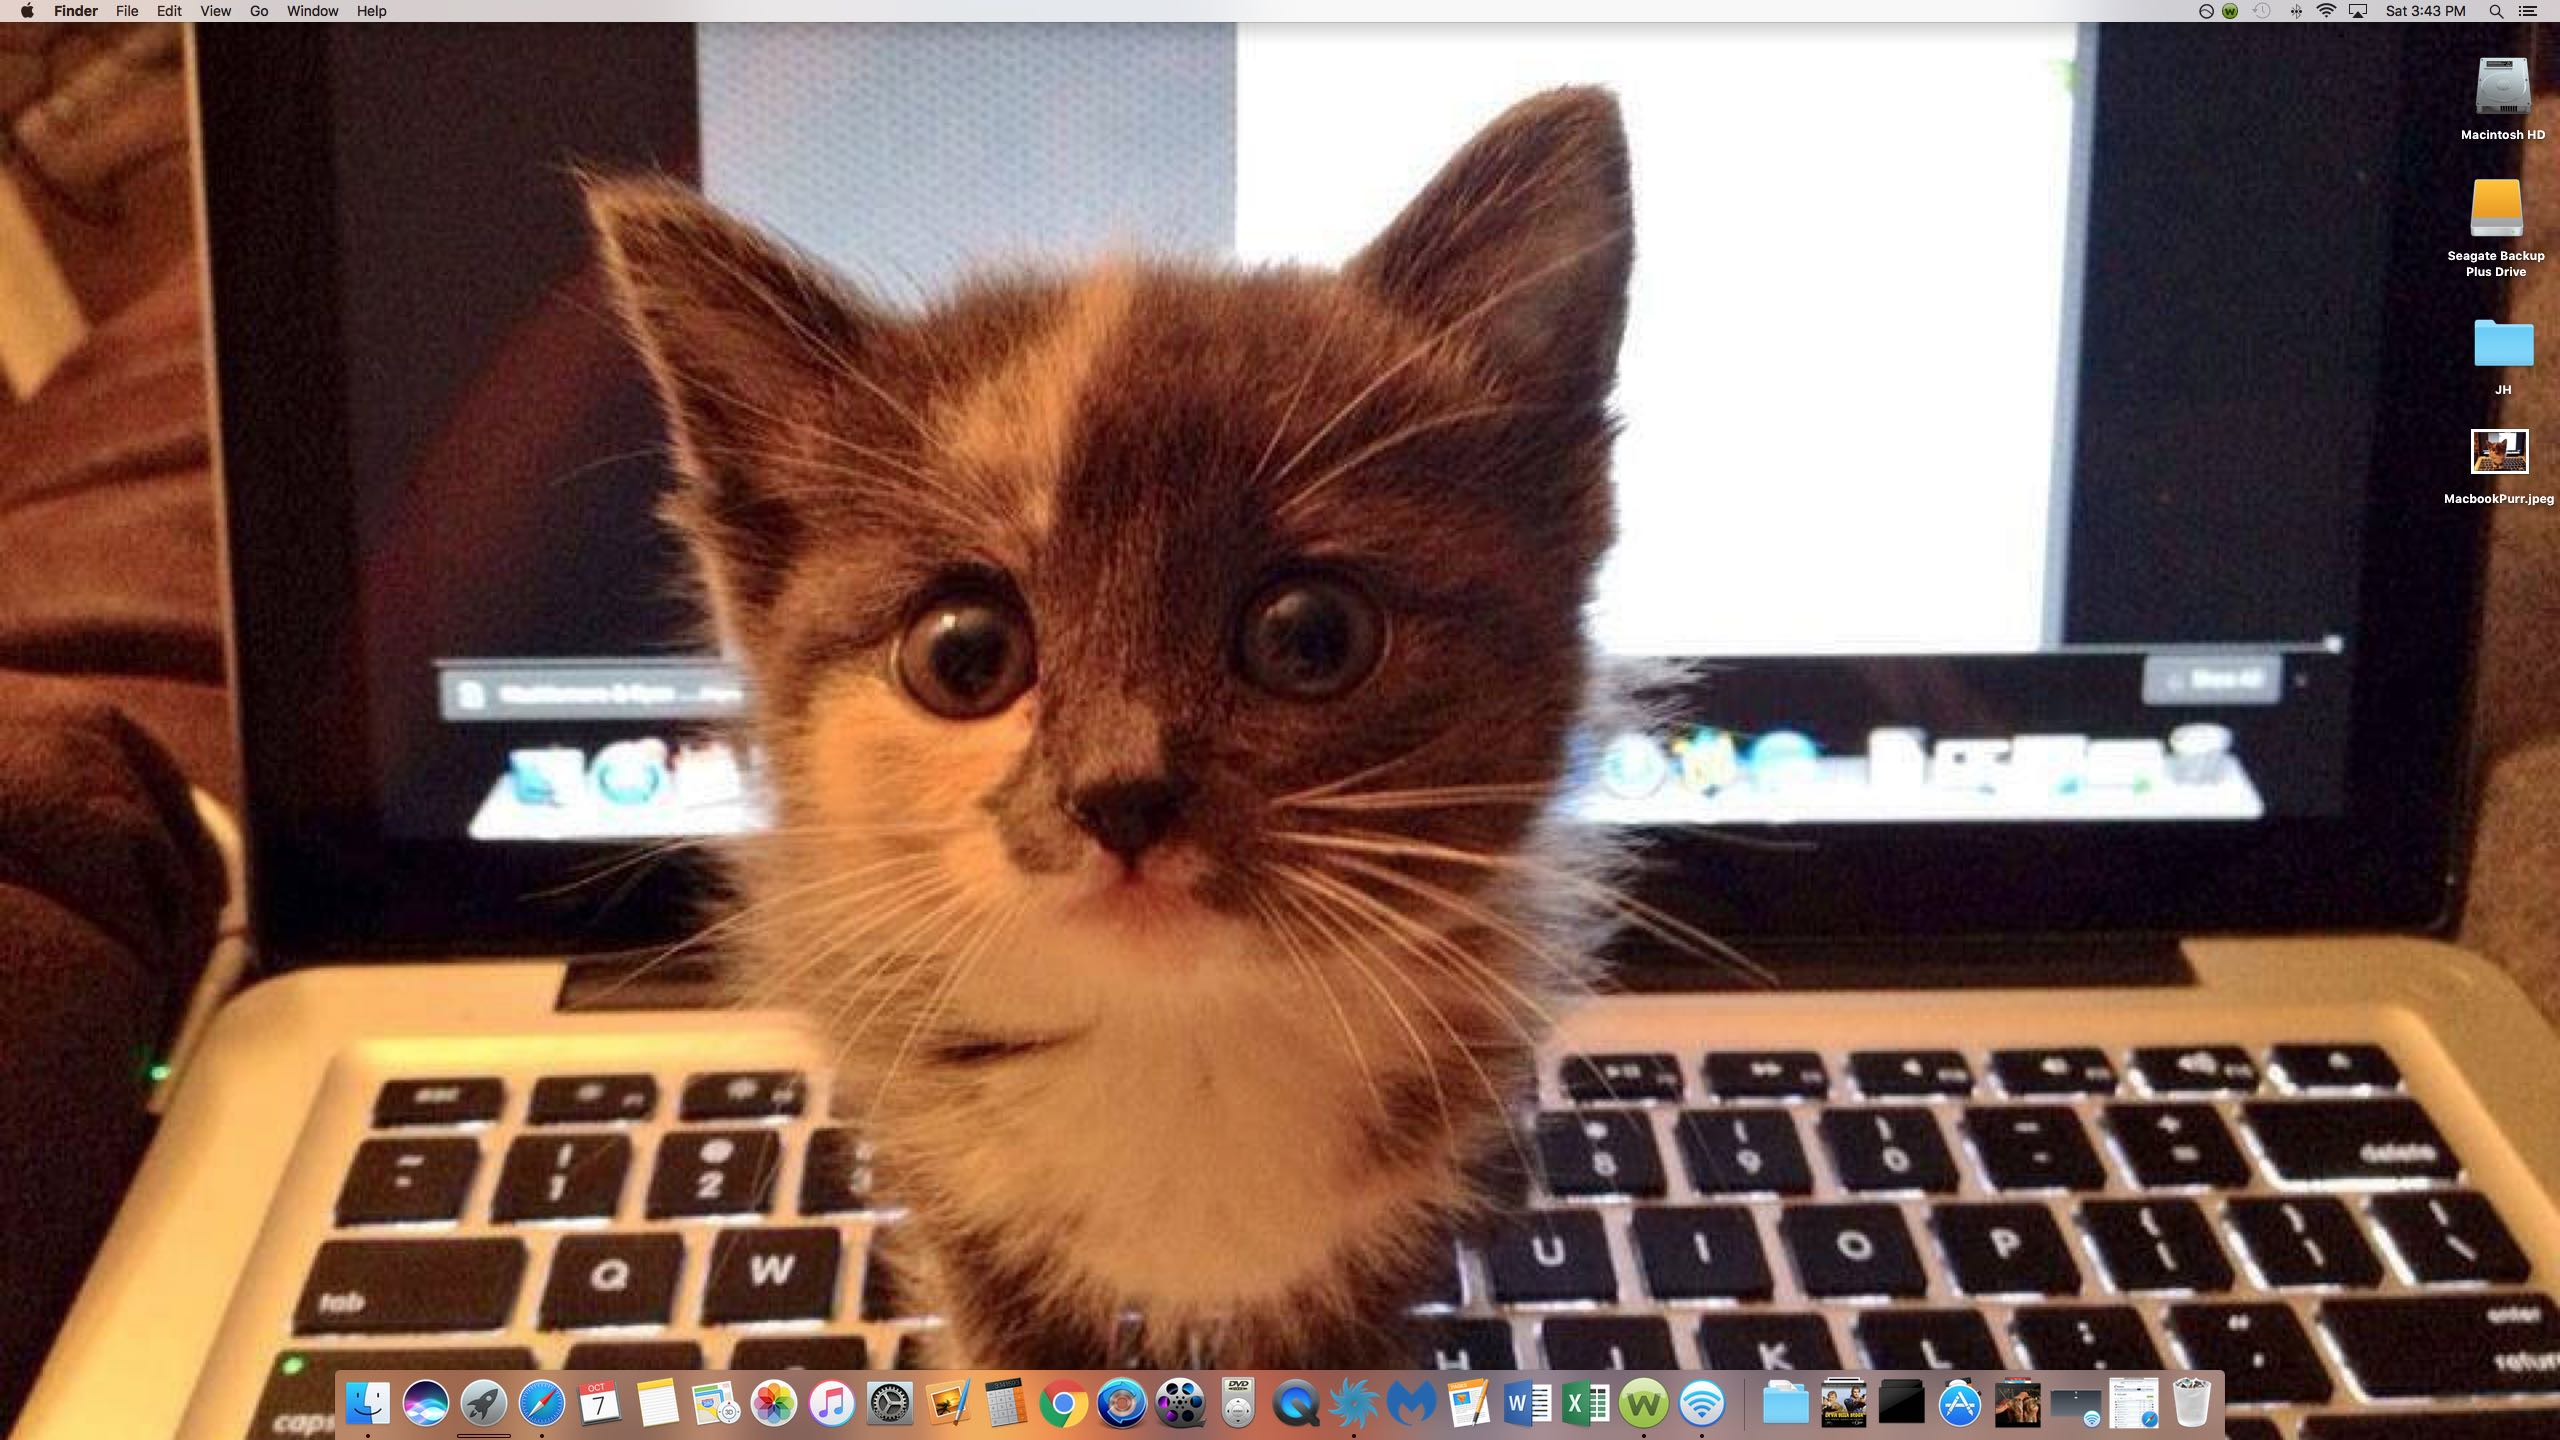 MacBook Purr.jpg